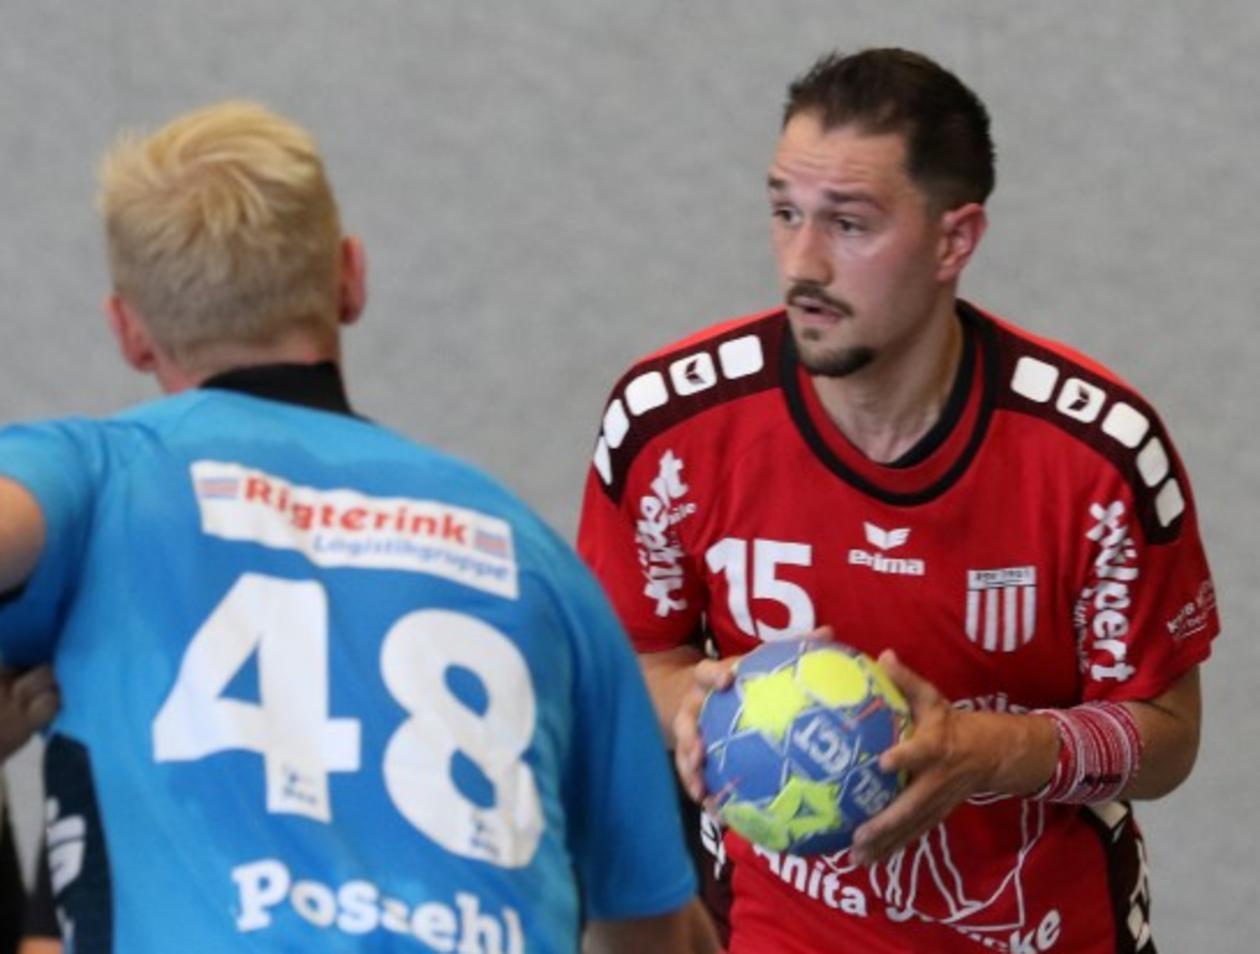 Sören Feldmann zog sich eine Verletzung an der Achillessehne zu. - Foto: Liesegang